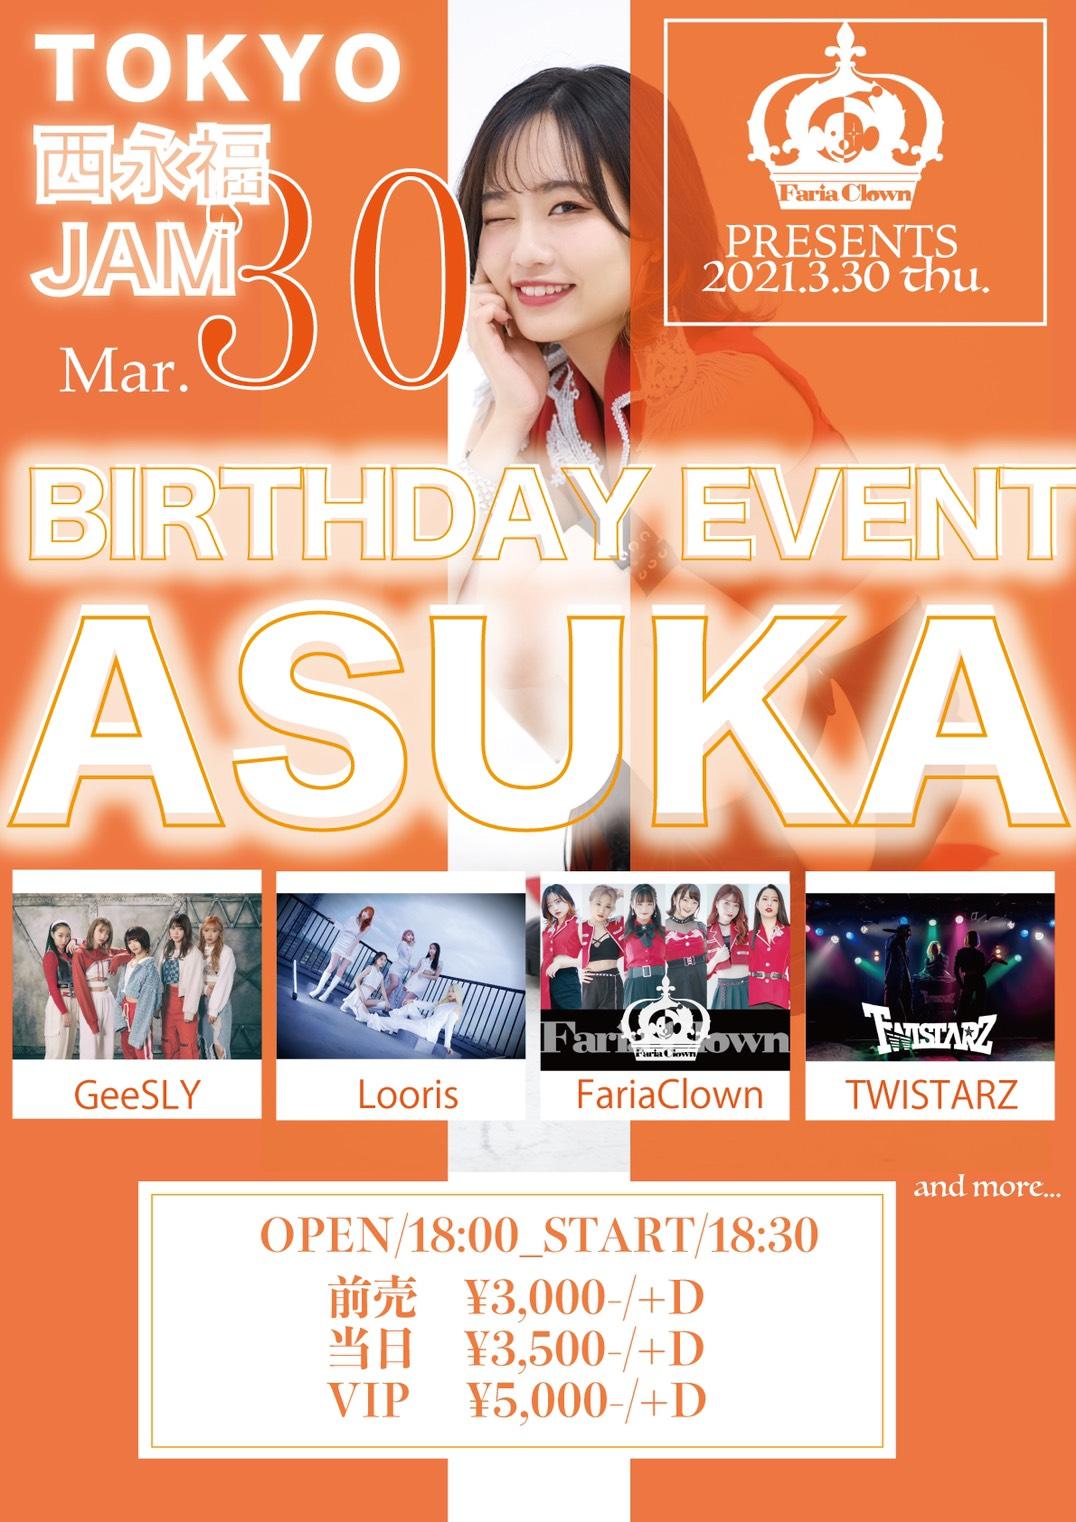 FariaClown PRESENTS BIRTHDAY EVENT ASUKA